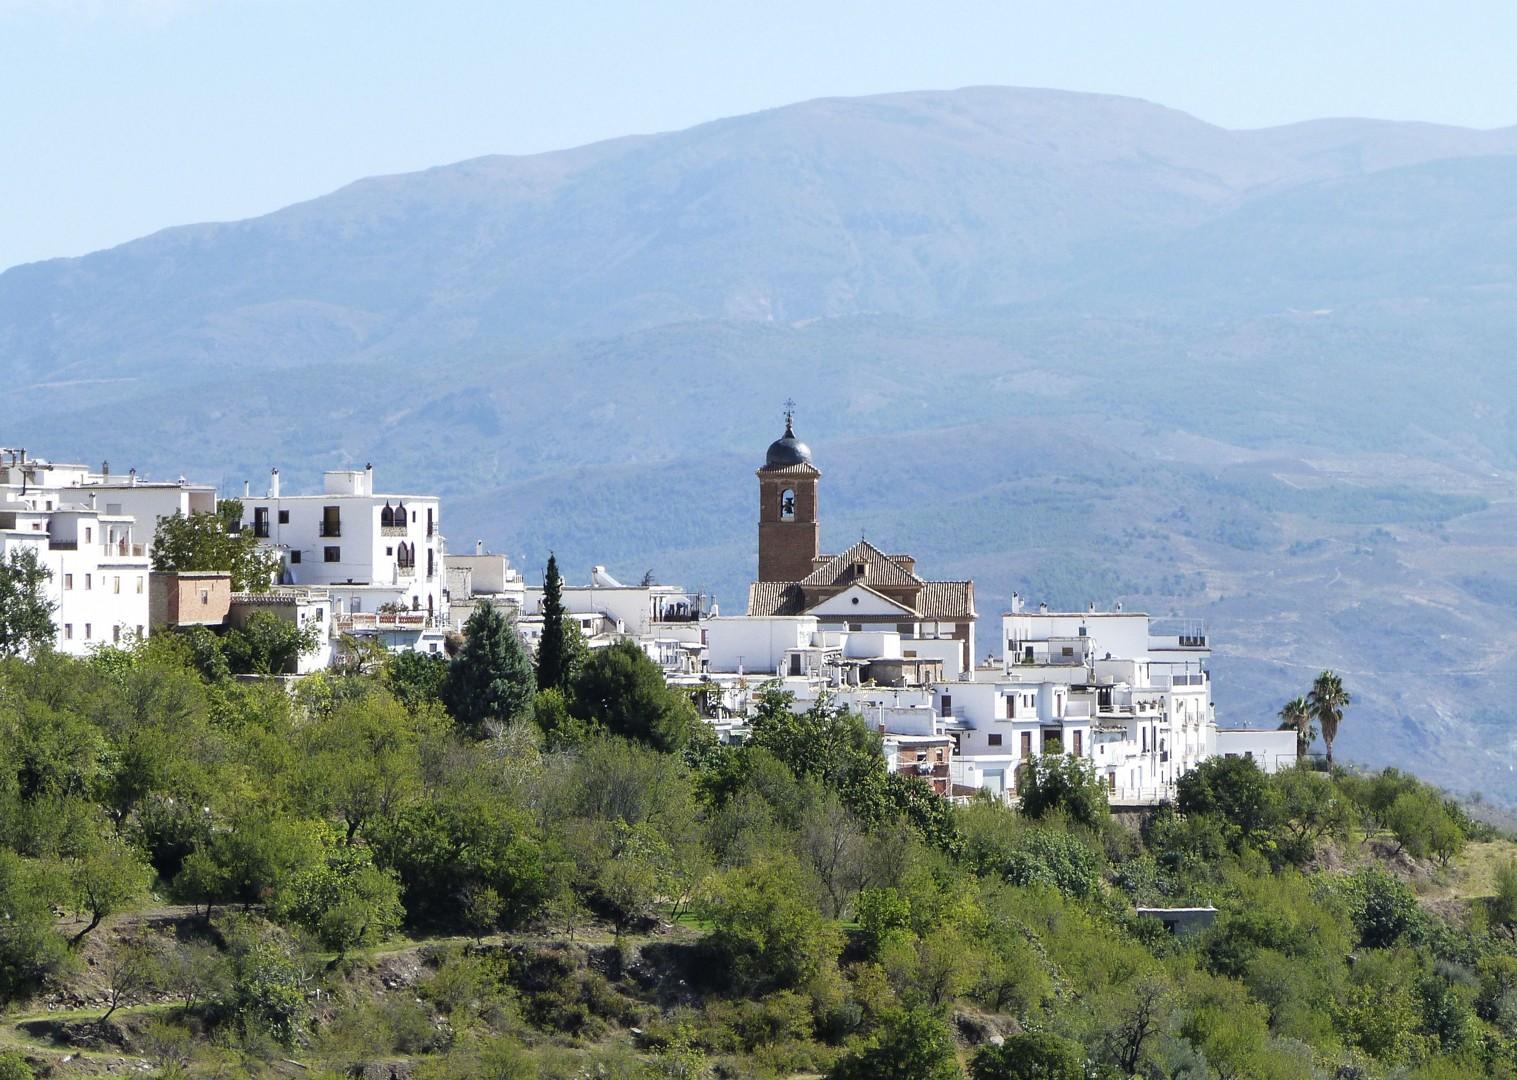 Grazalema-self-guided-road-cycling-holiday-los-pueblos-blancos-andalucia-spain.jpg - Southern Spain - Andalucia - Los Pueblos Blancos - Self-Guided Road Cycling Holiday - Road Cycling